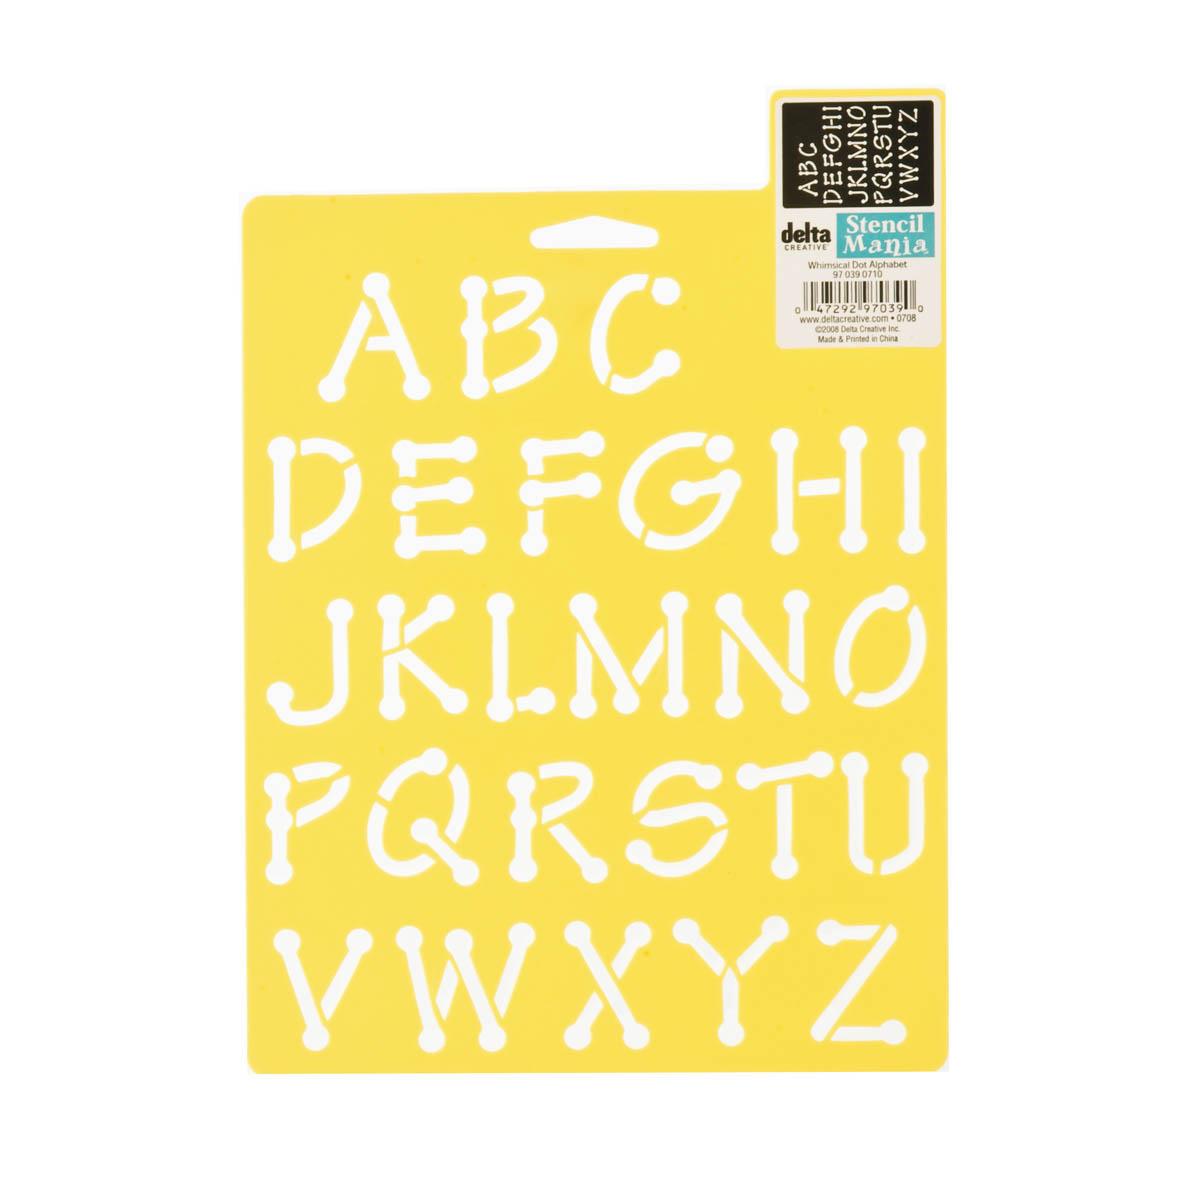 Delta Stencil Mania™ - Alphabet - Whimsical Dot